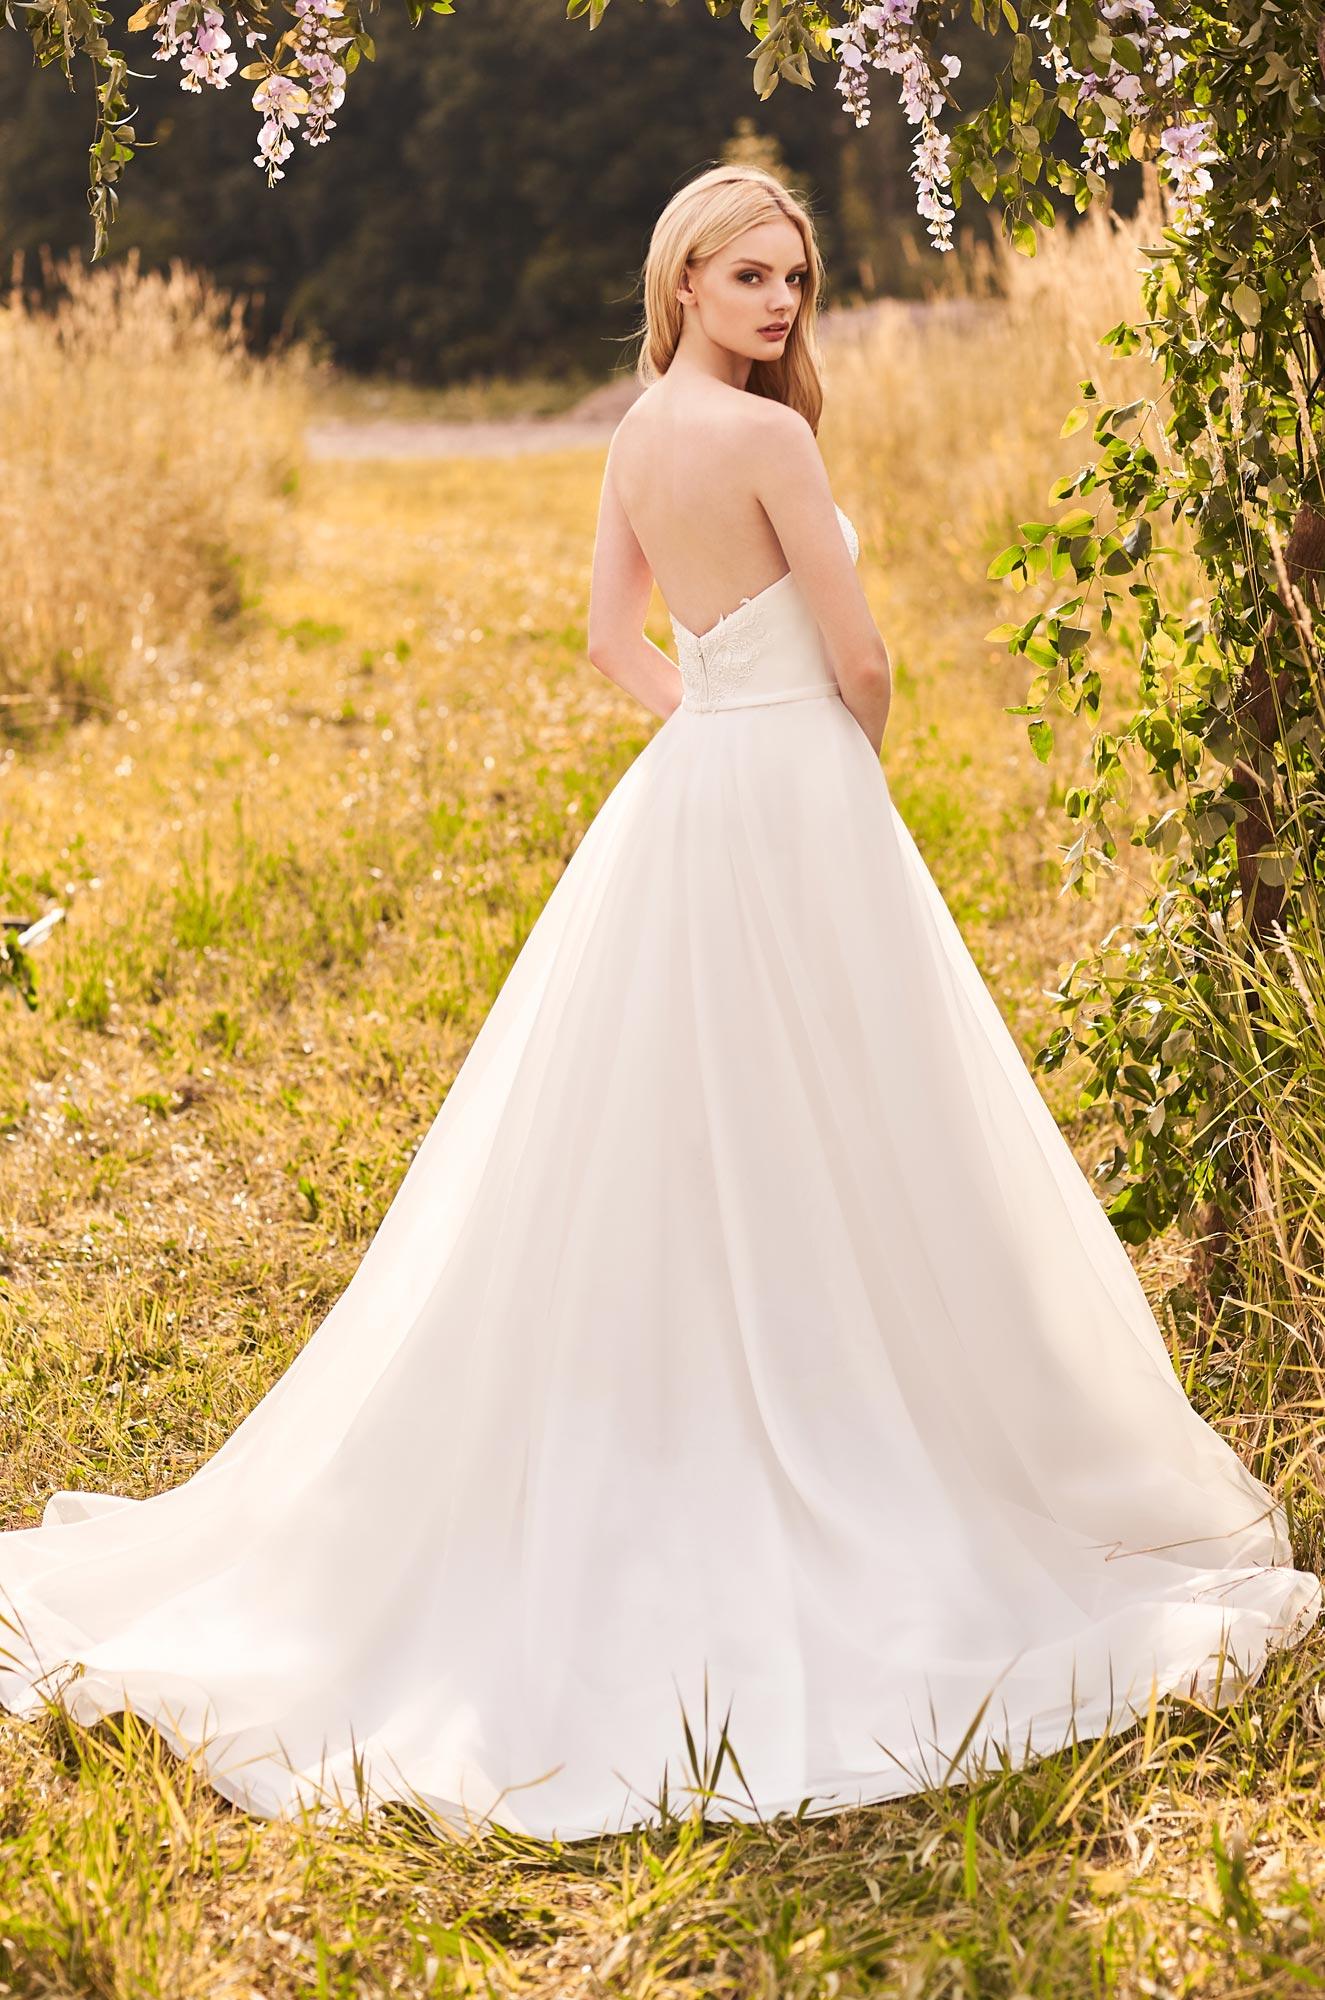 Beaded Strapless Wedding Dress - Style #2291 | Mikaella Bridal